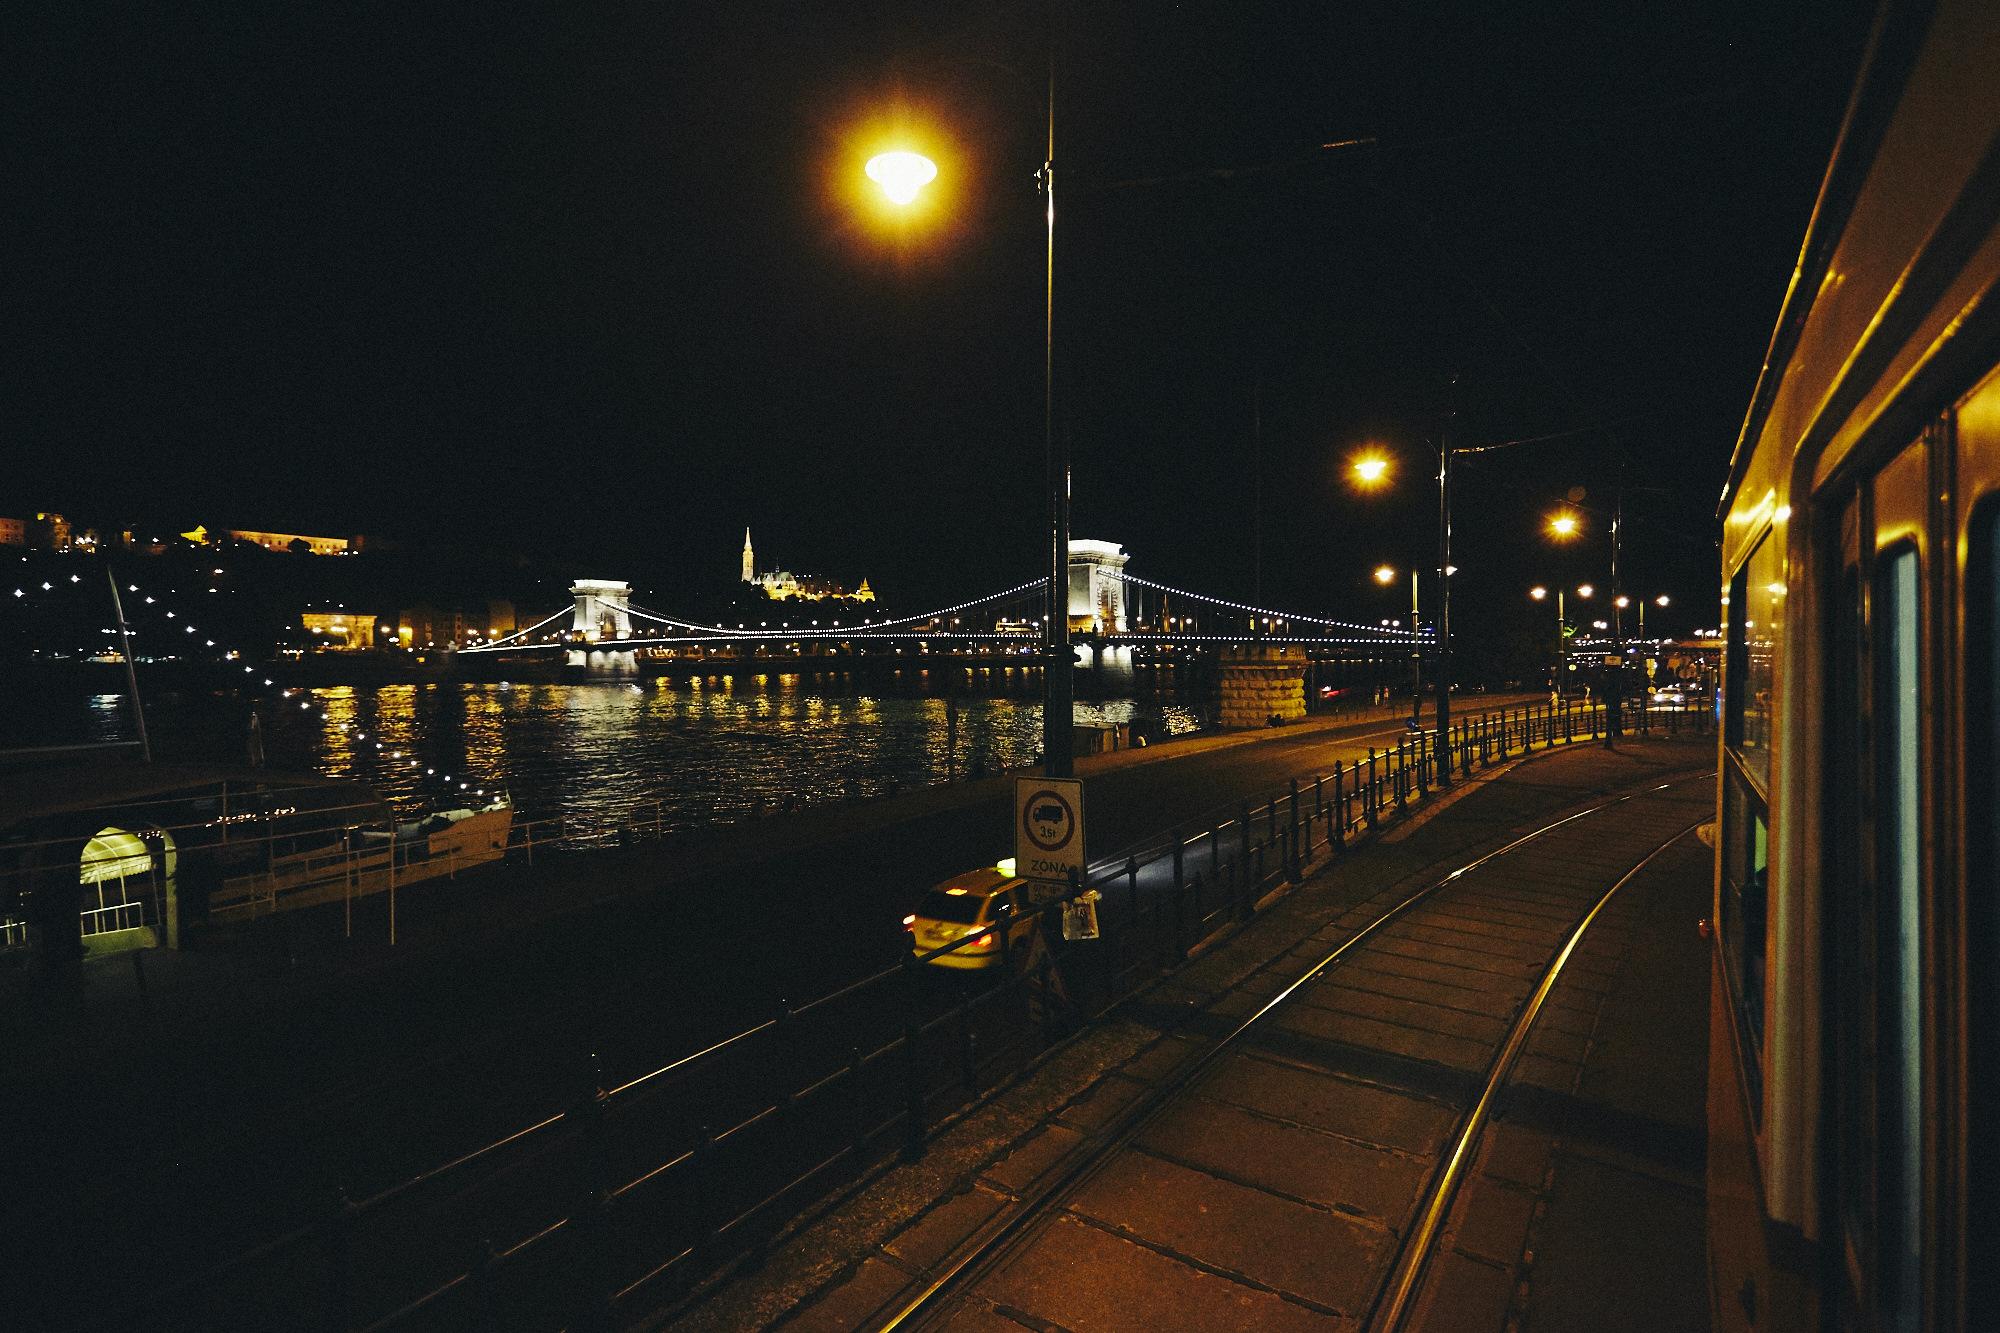 maxmotel_budapest_aug2015_day02_18_night_1776